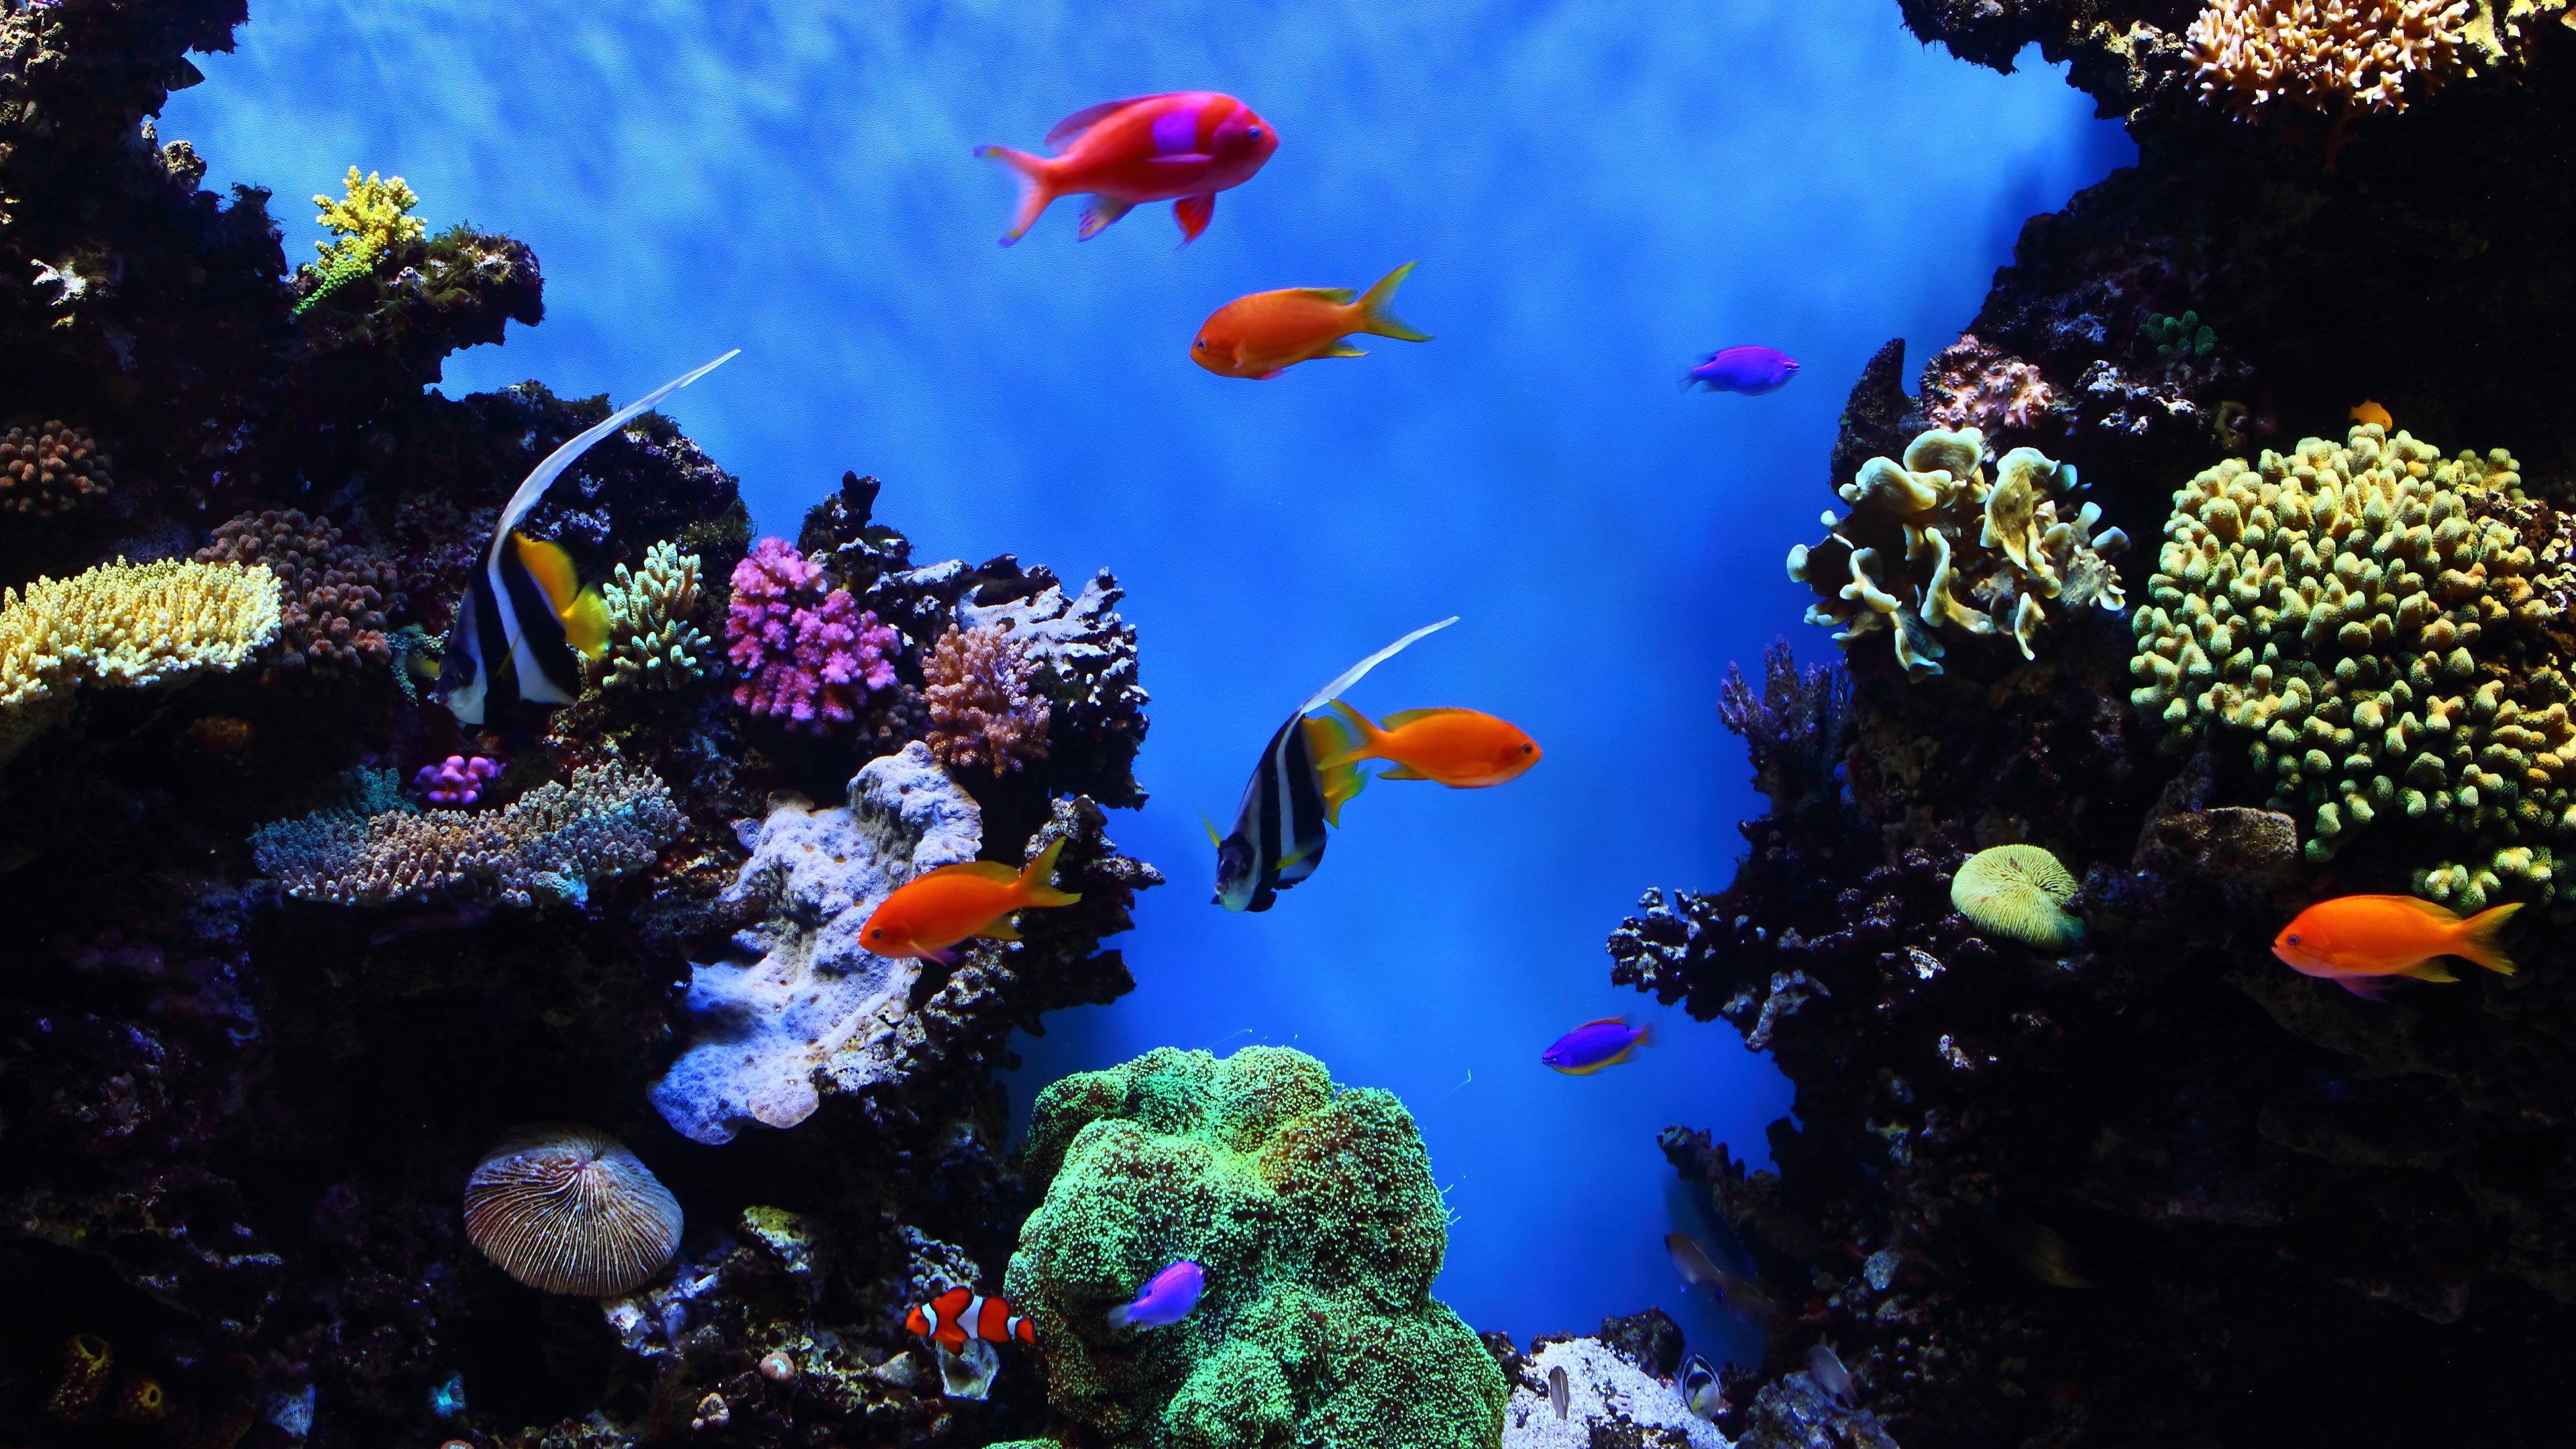 4K Aquarium Screensaver And TV Wallpaper